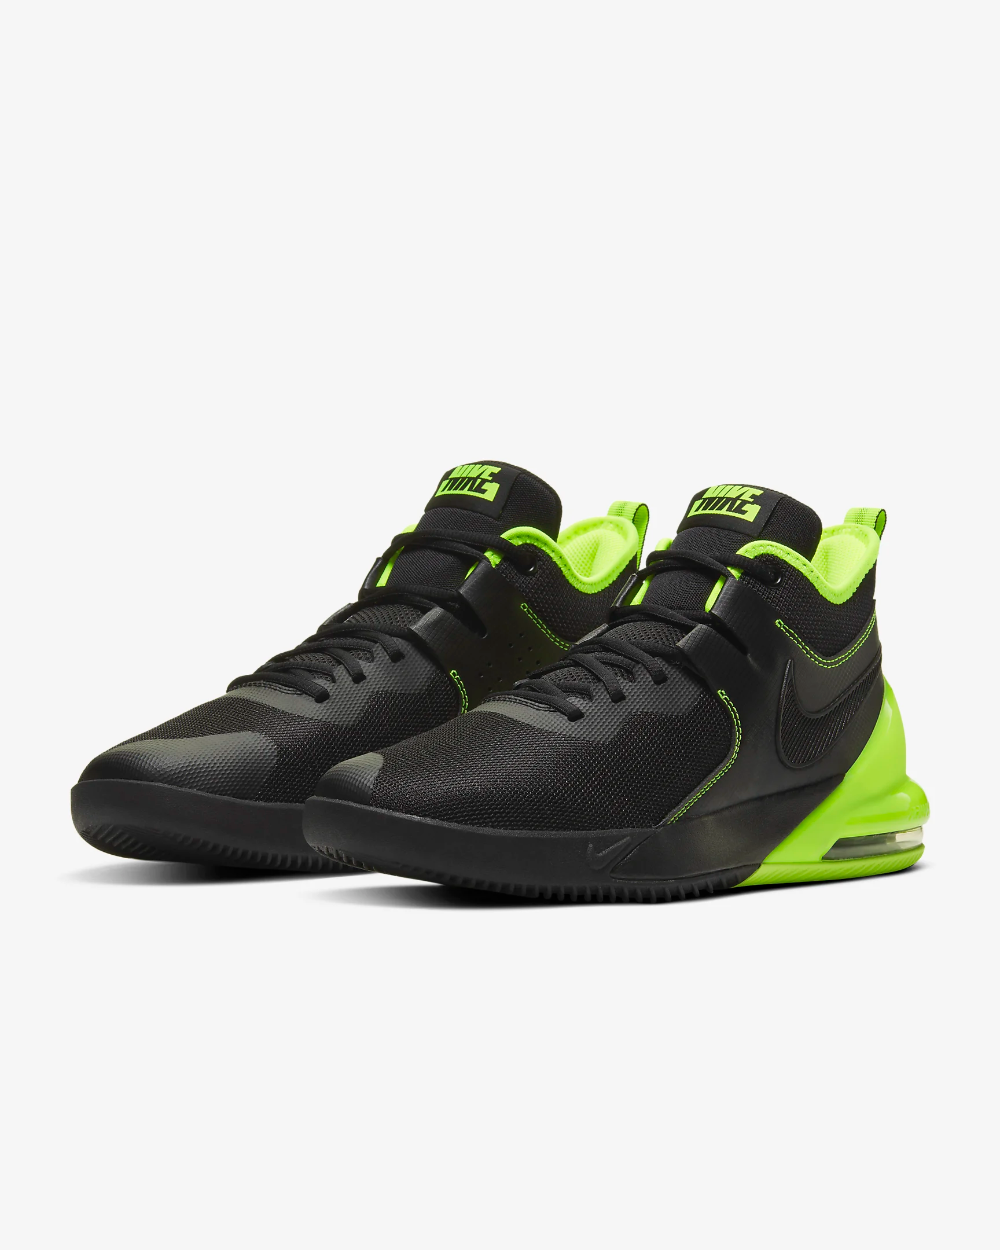 Nike Air Max Impact Basketball Shoe Nike Com In 2020 Nike Basketball Shoes Basketball Shoes Nike Air Max